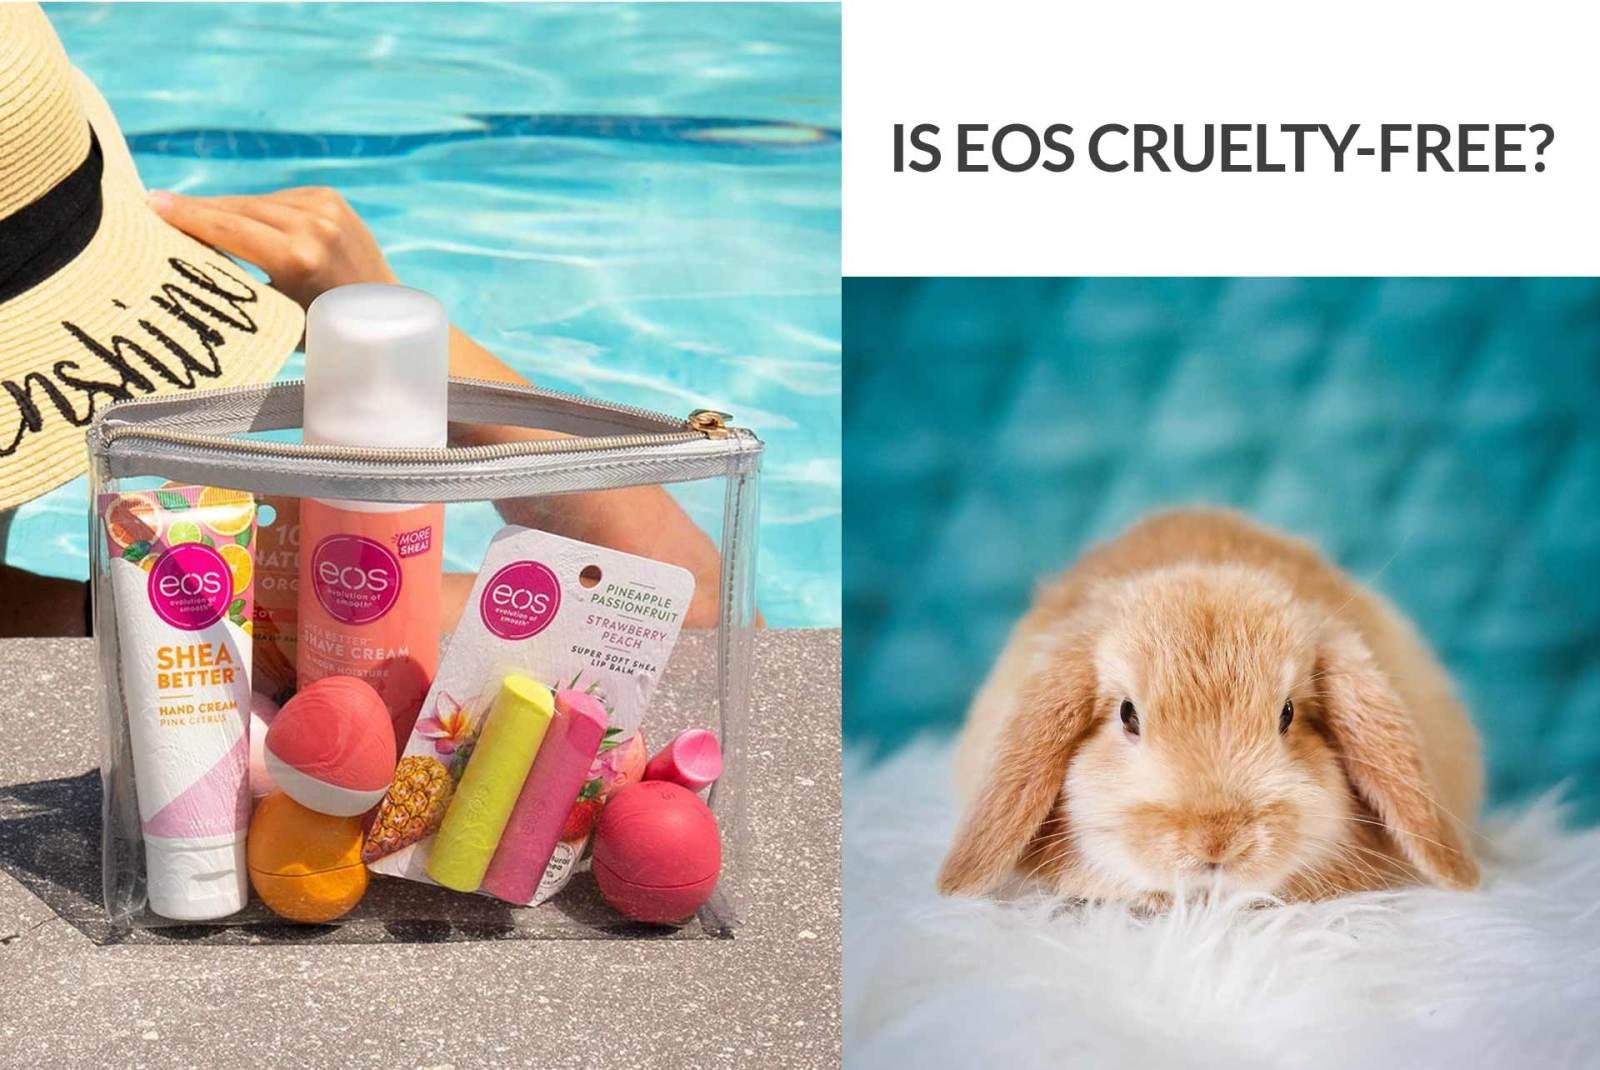 Is EOS Cruelty-Free?